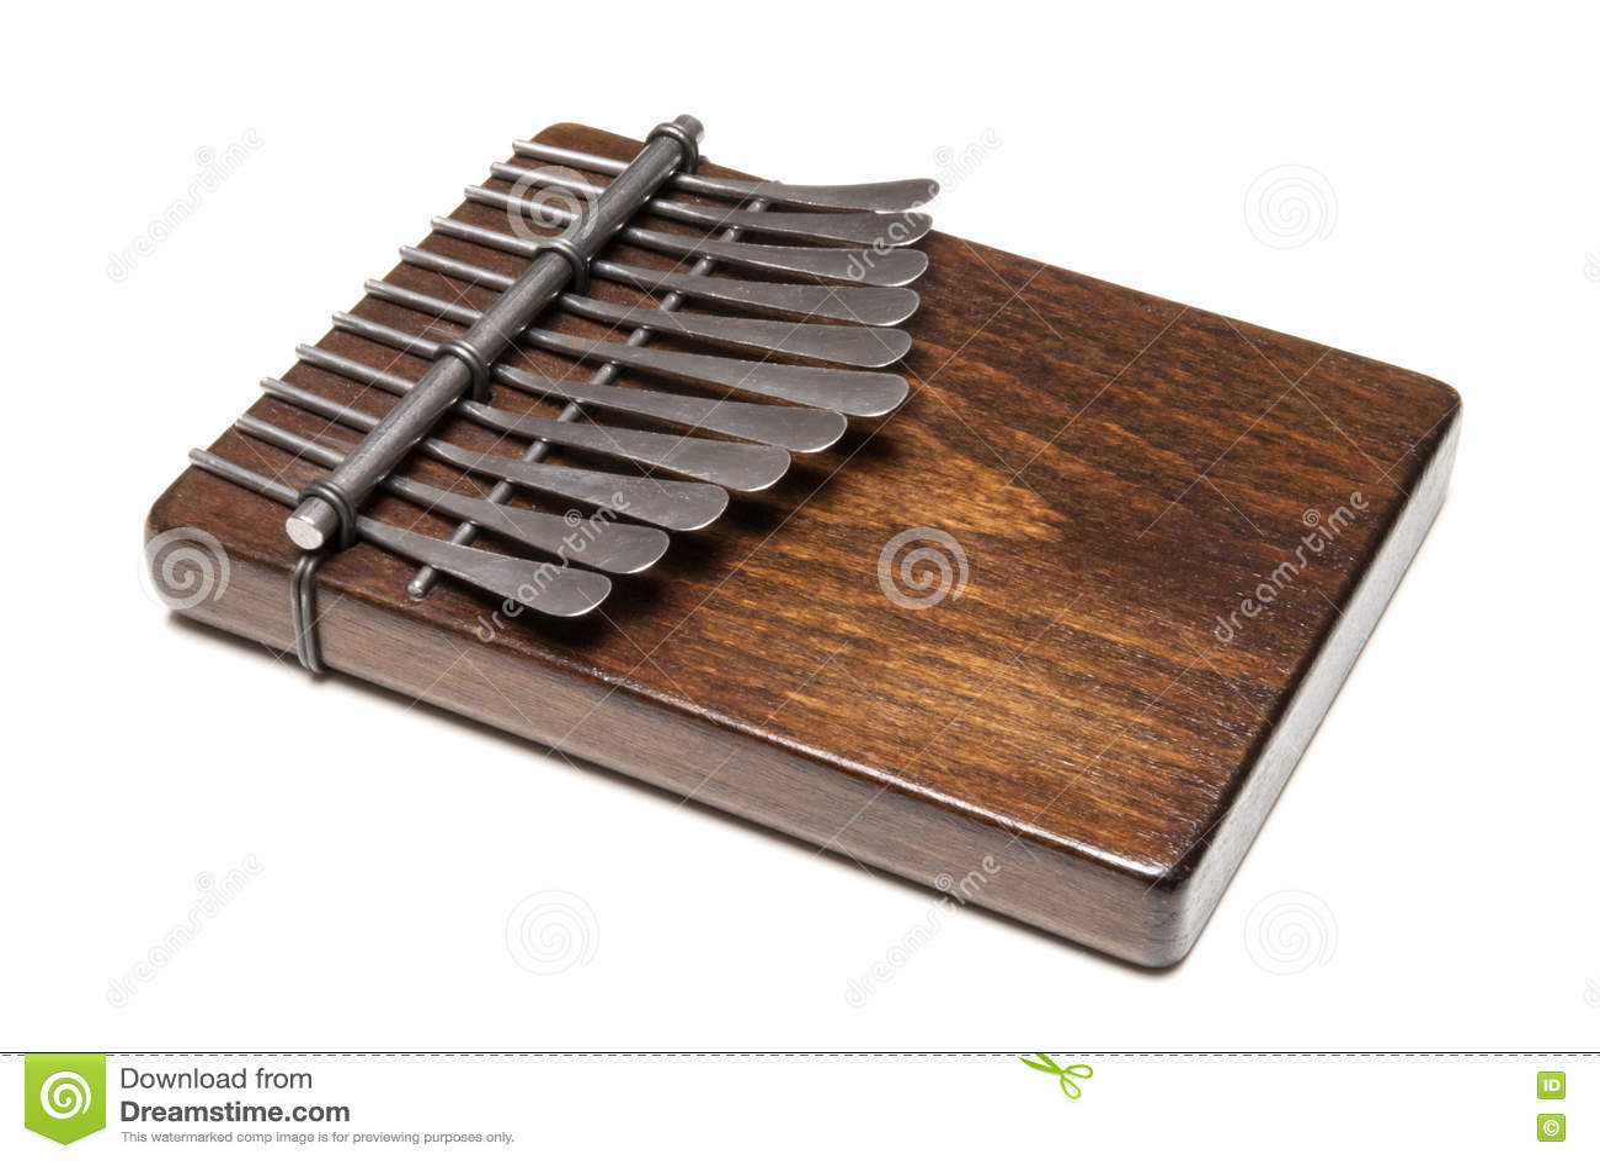 Kalimba Dinstrument Ou Piano Africain Traditionnel De  ~ Instrument En Bois Africain